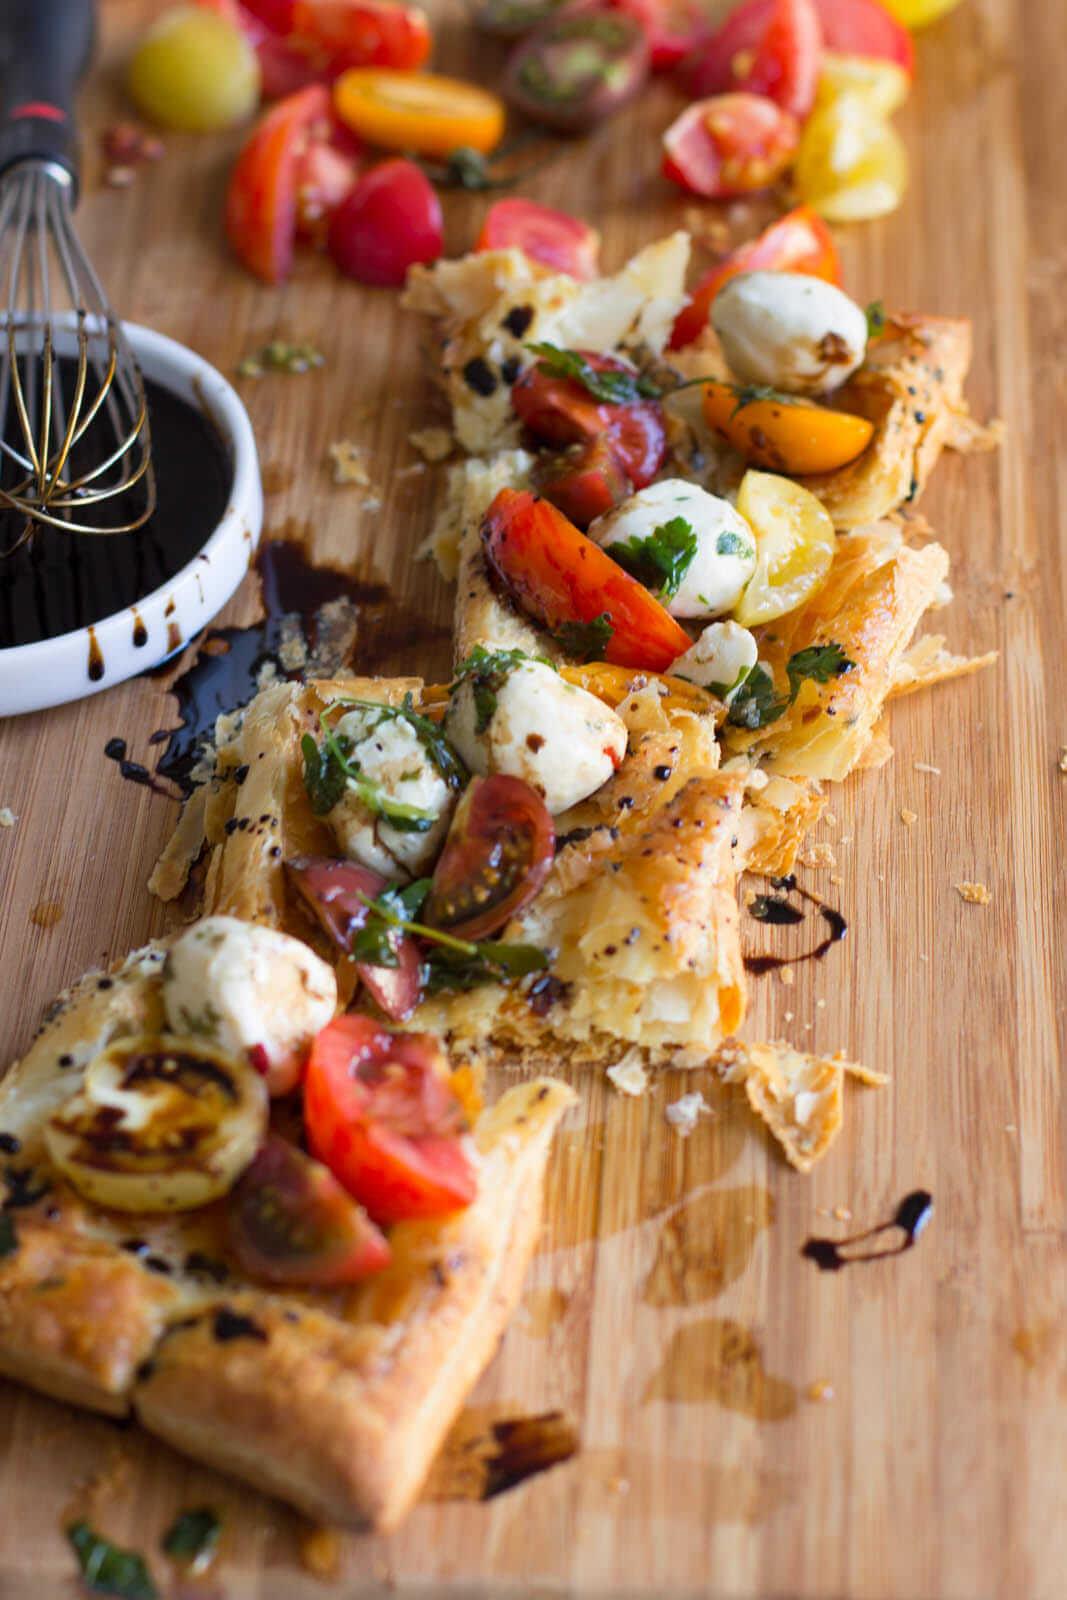 Heirloom Tomato and Mozzarella Tart